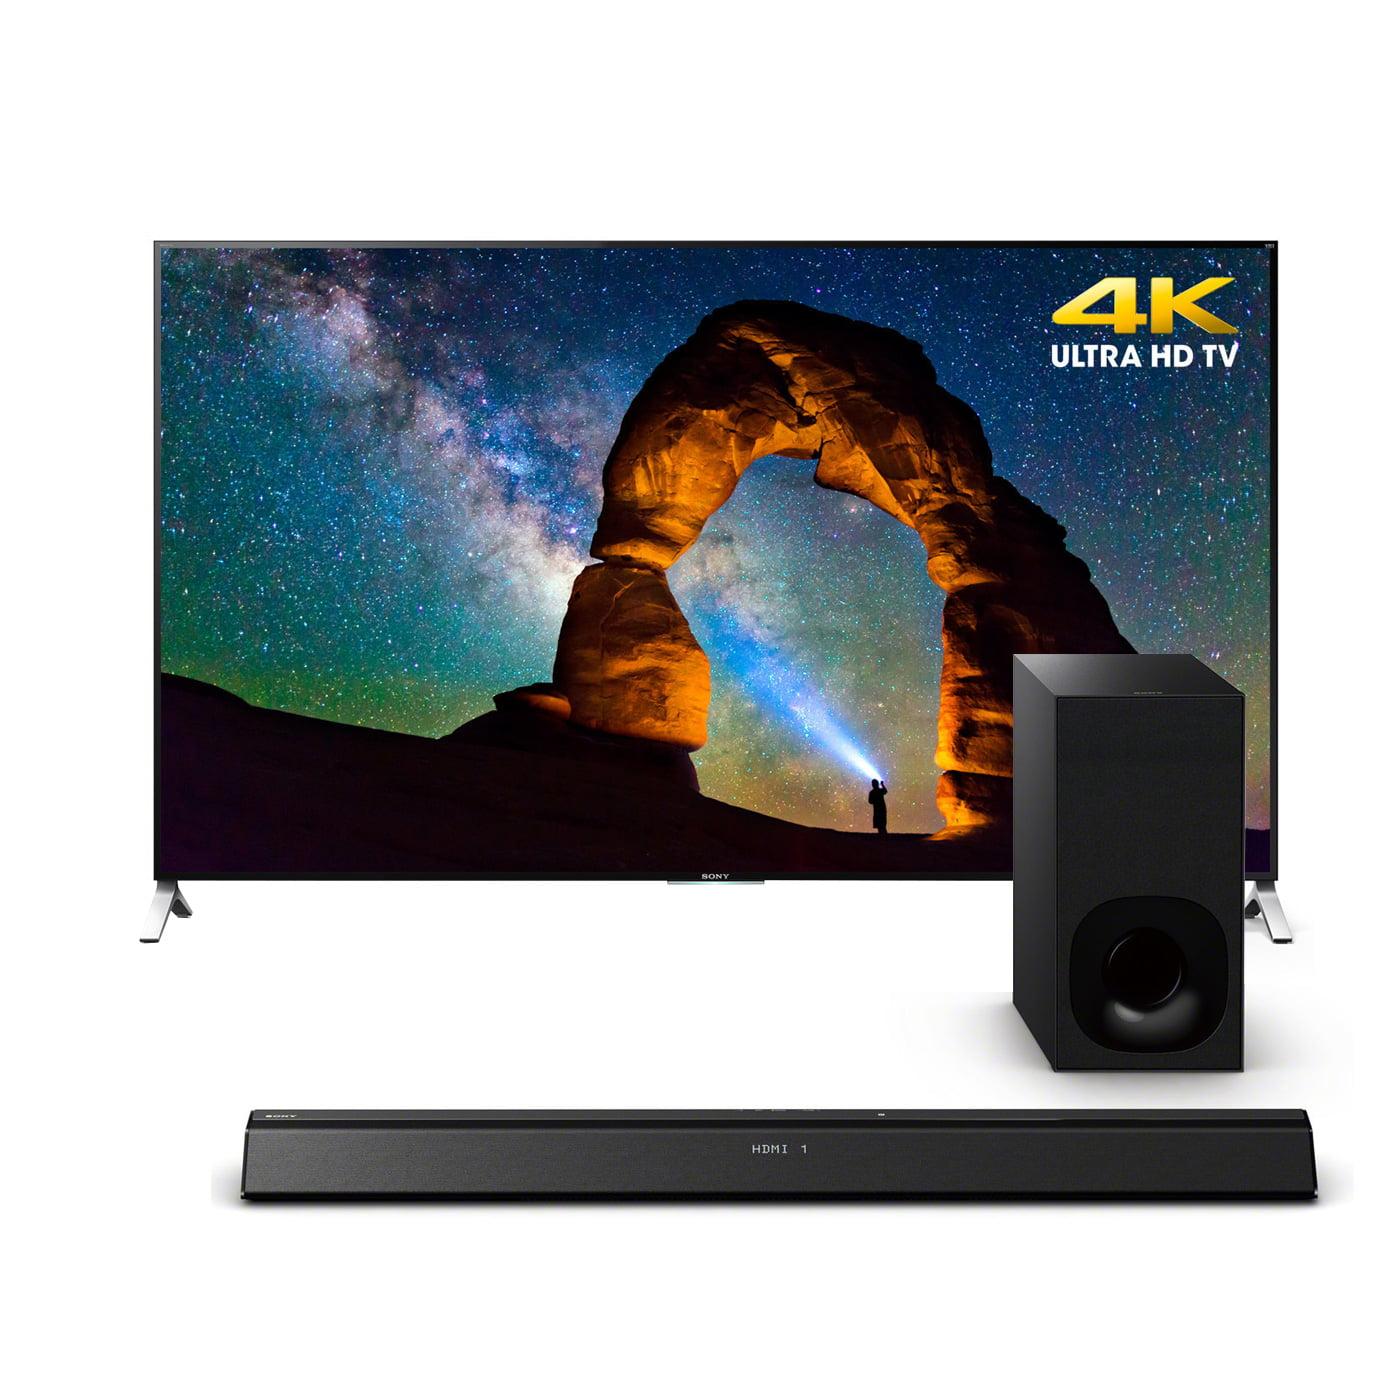 Sony BRAVIA XBR-75X910C HDTV Windows